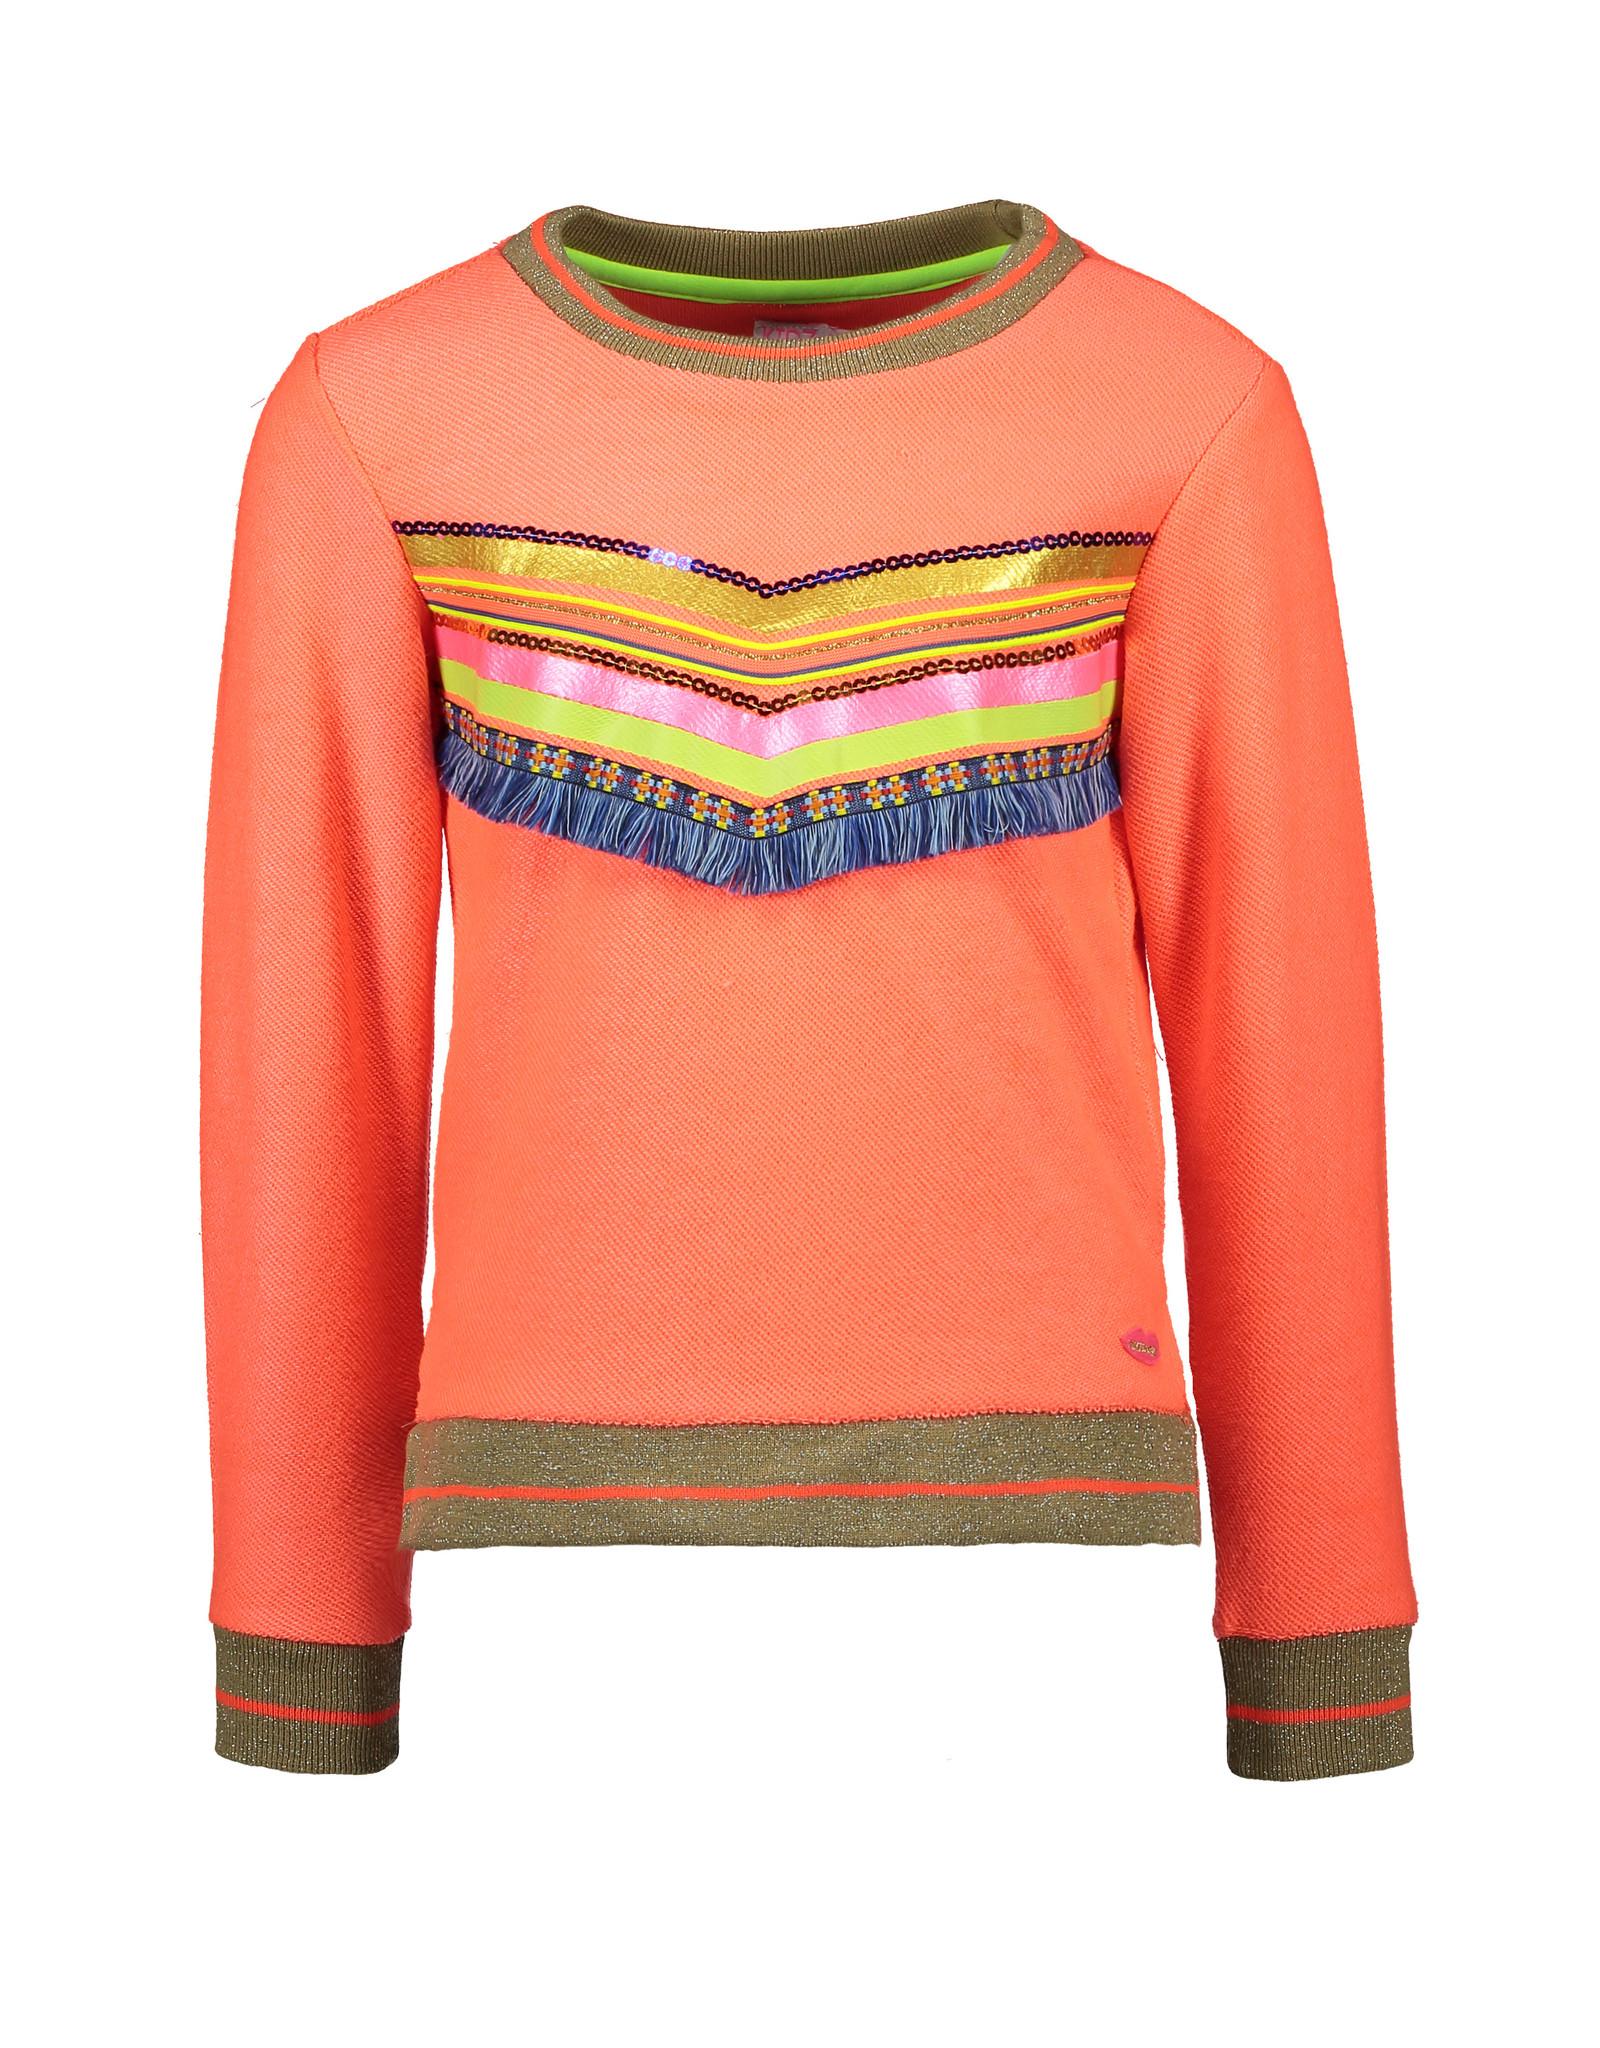 Kidz-Art Sweater with slits + striped rib cuffs + stripe and fringe tape artwork